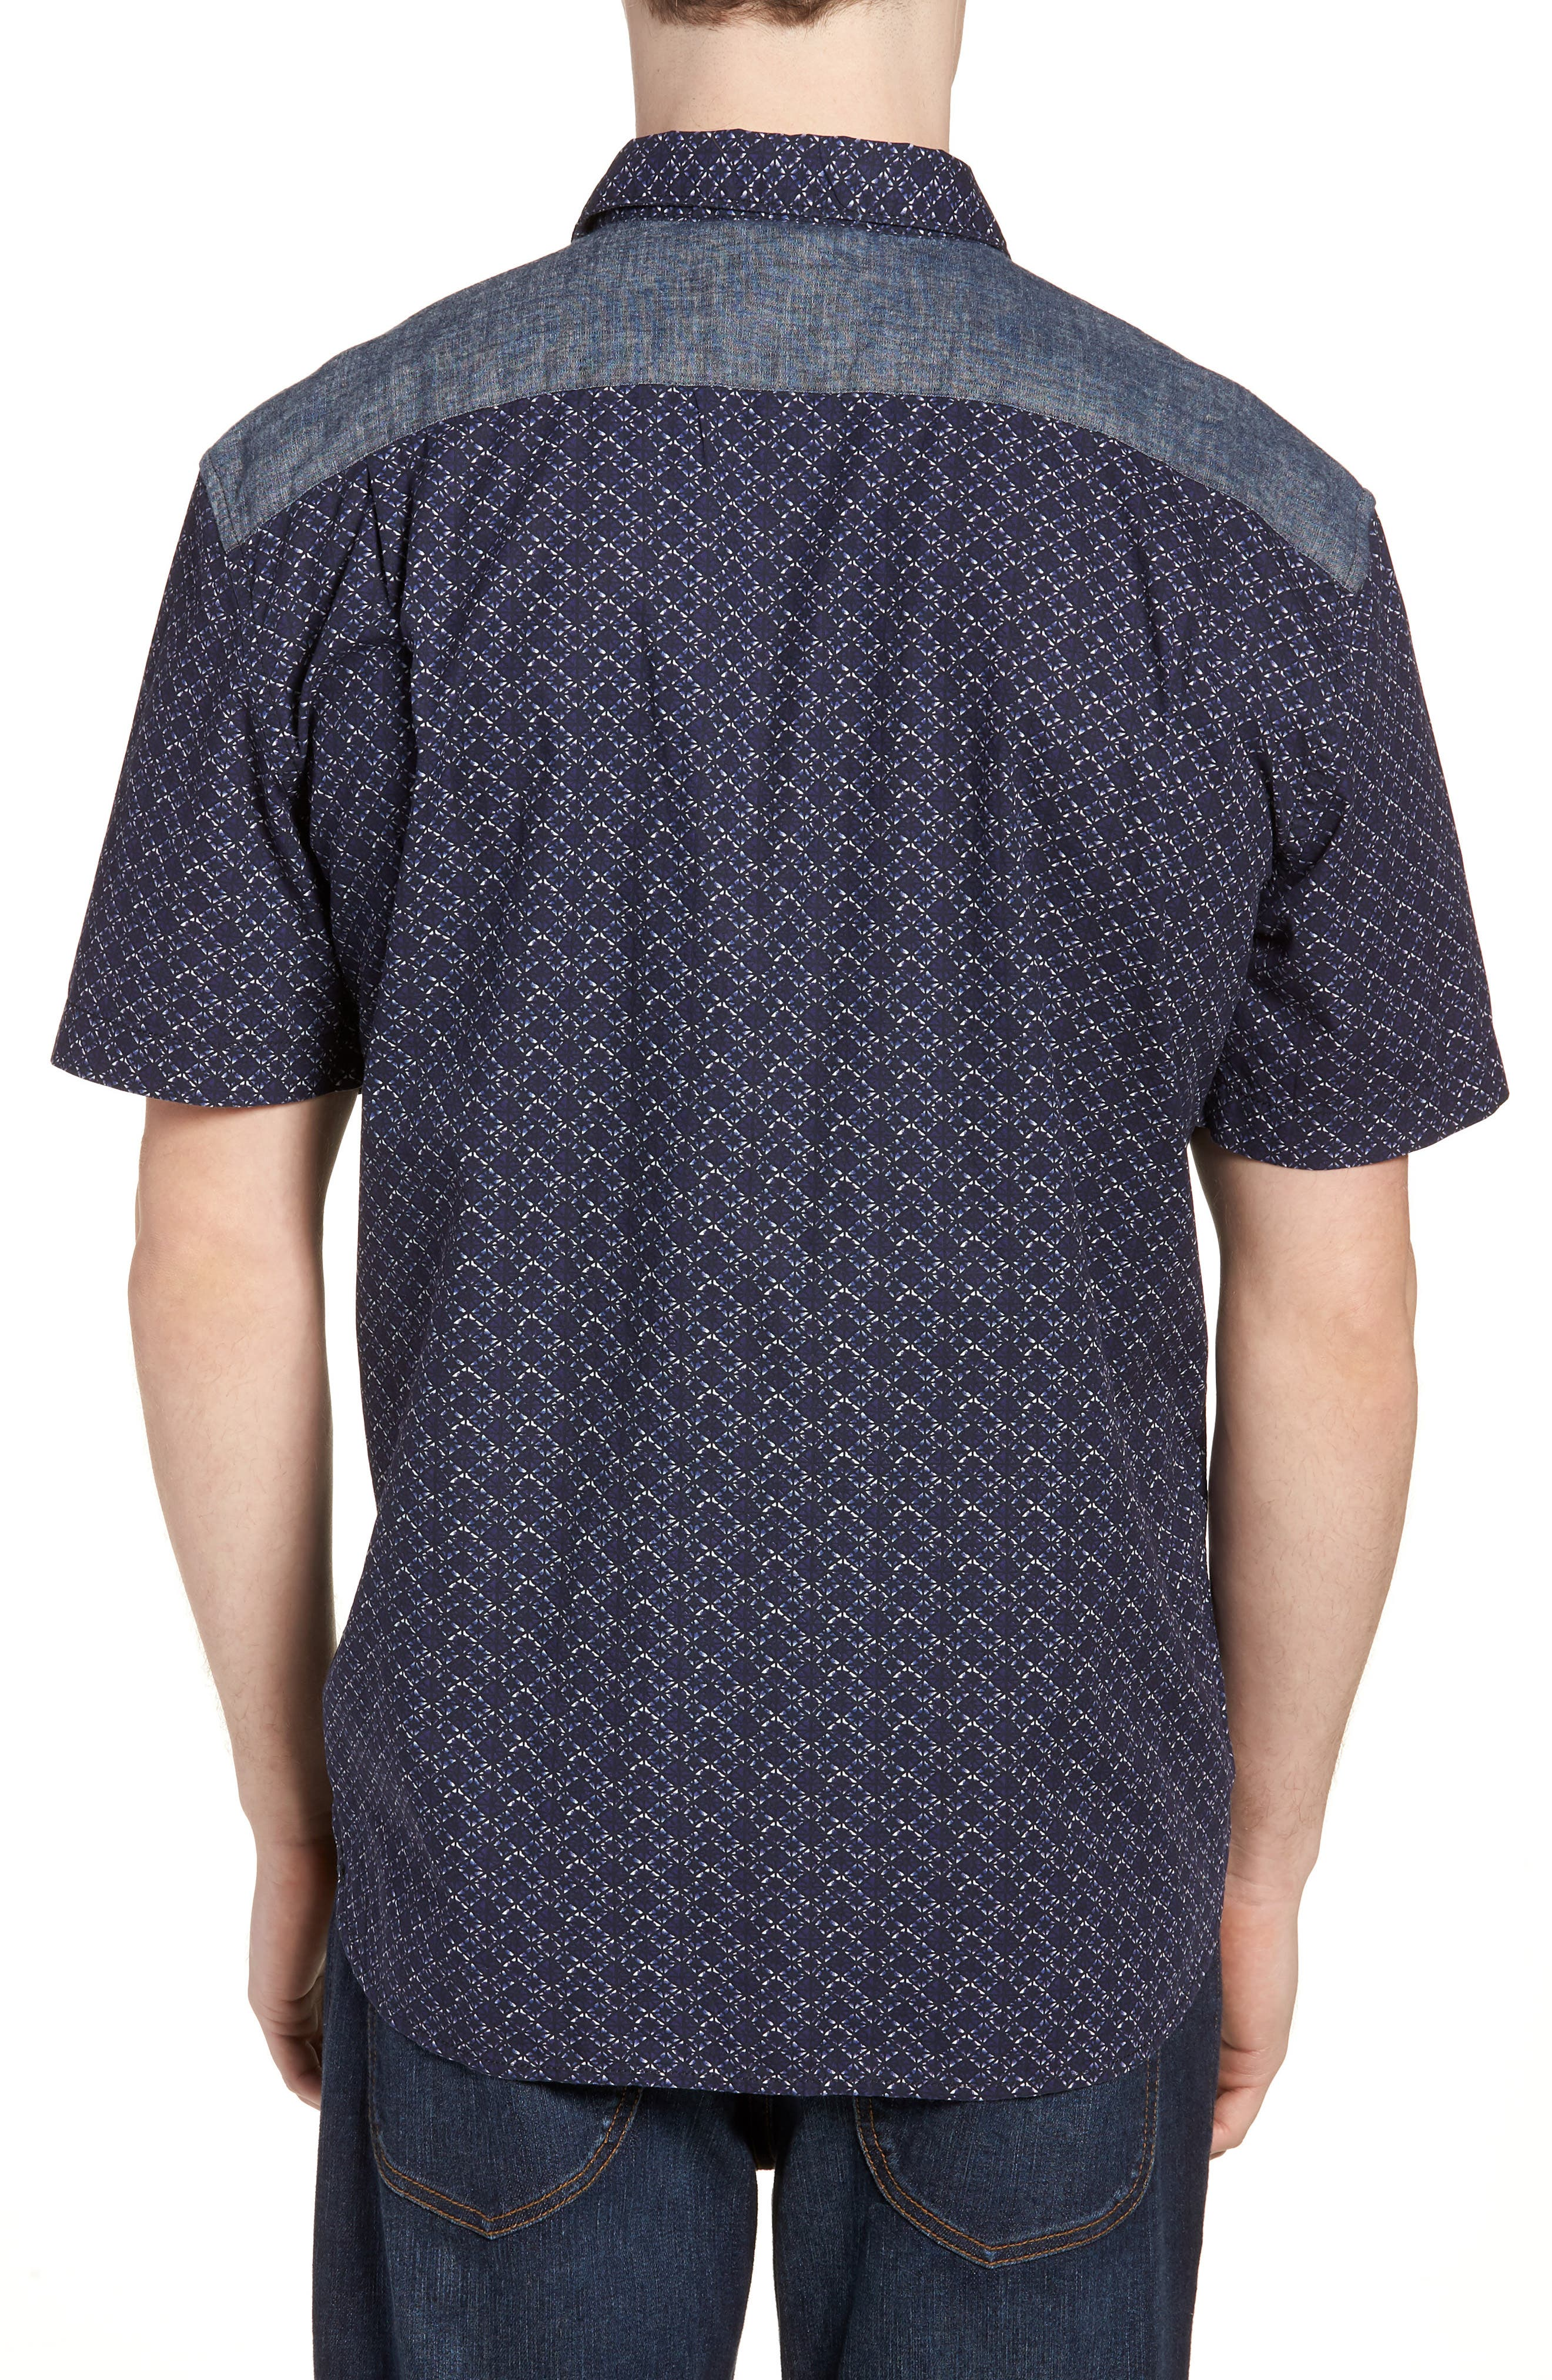 Kast Relaxed Fit Short Sleeve Sport Shirt,                             Alternate thumbnail 2, color,                             410